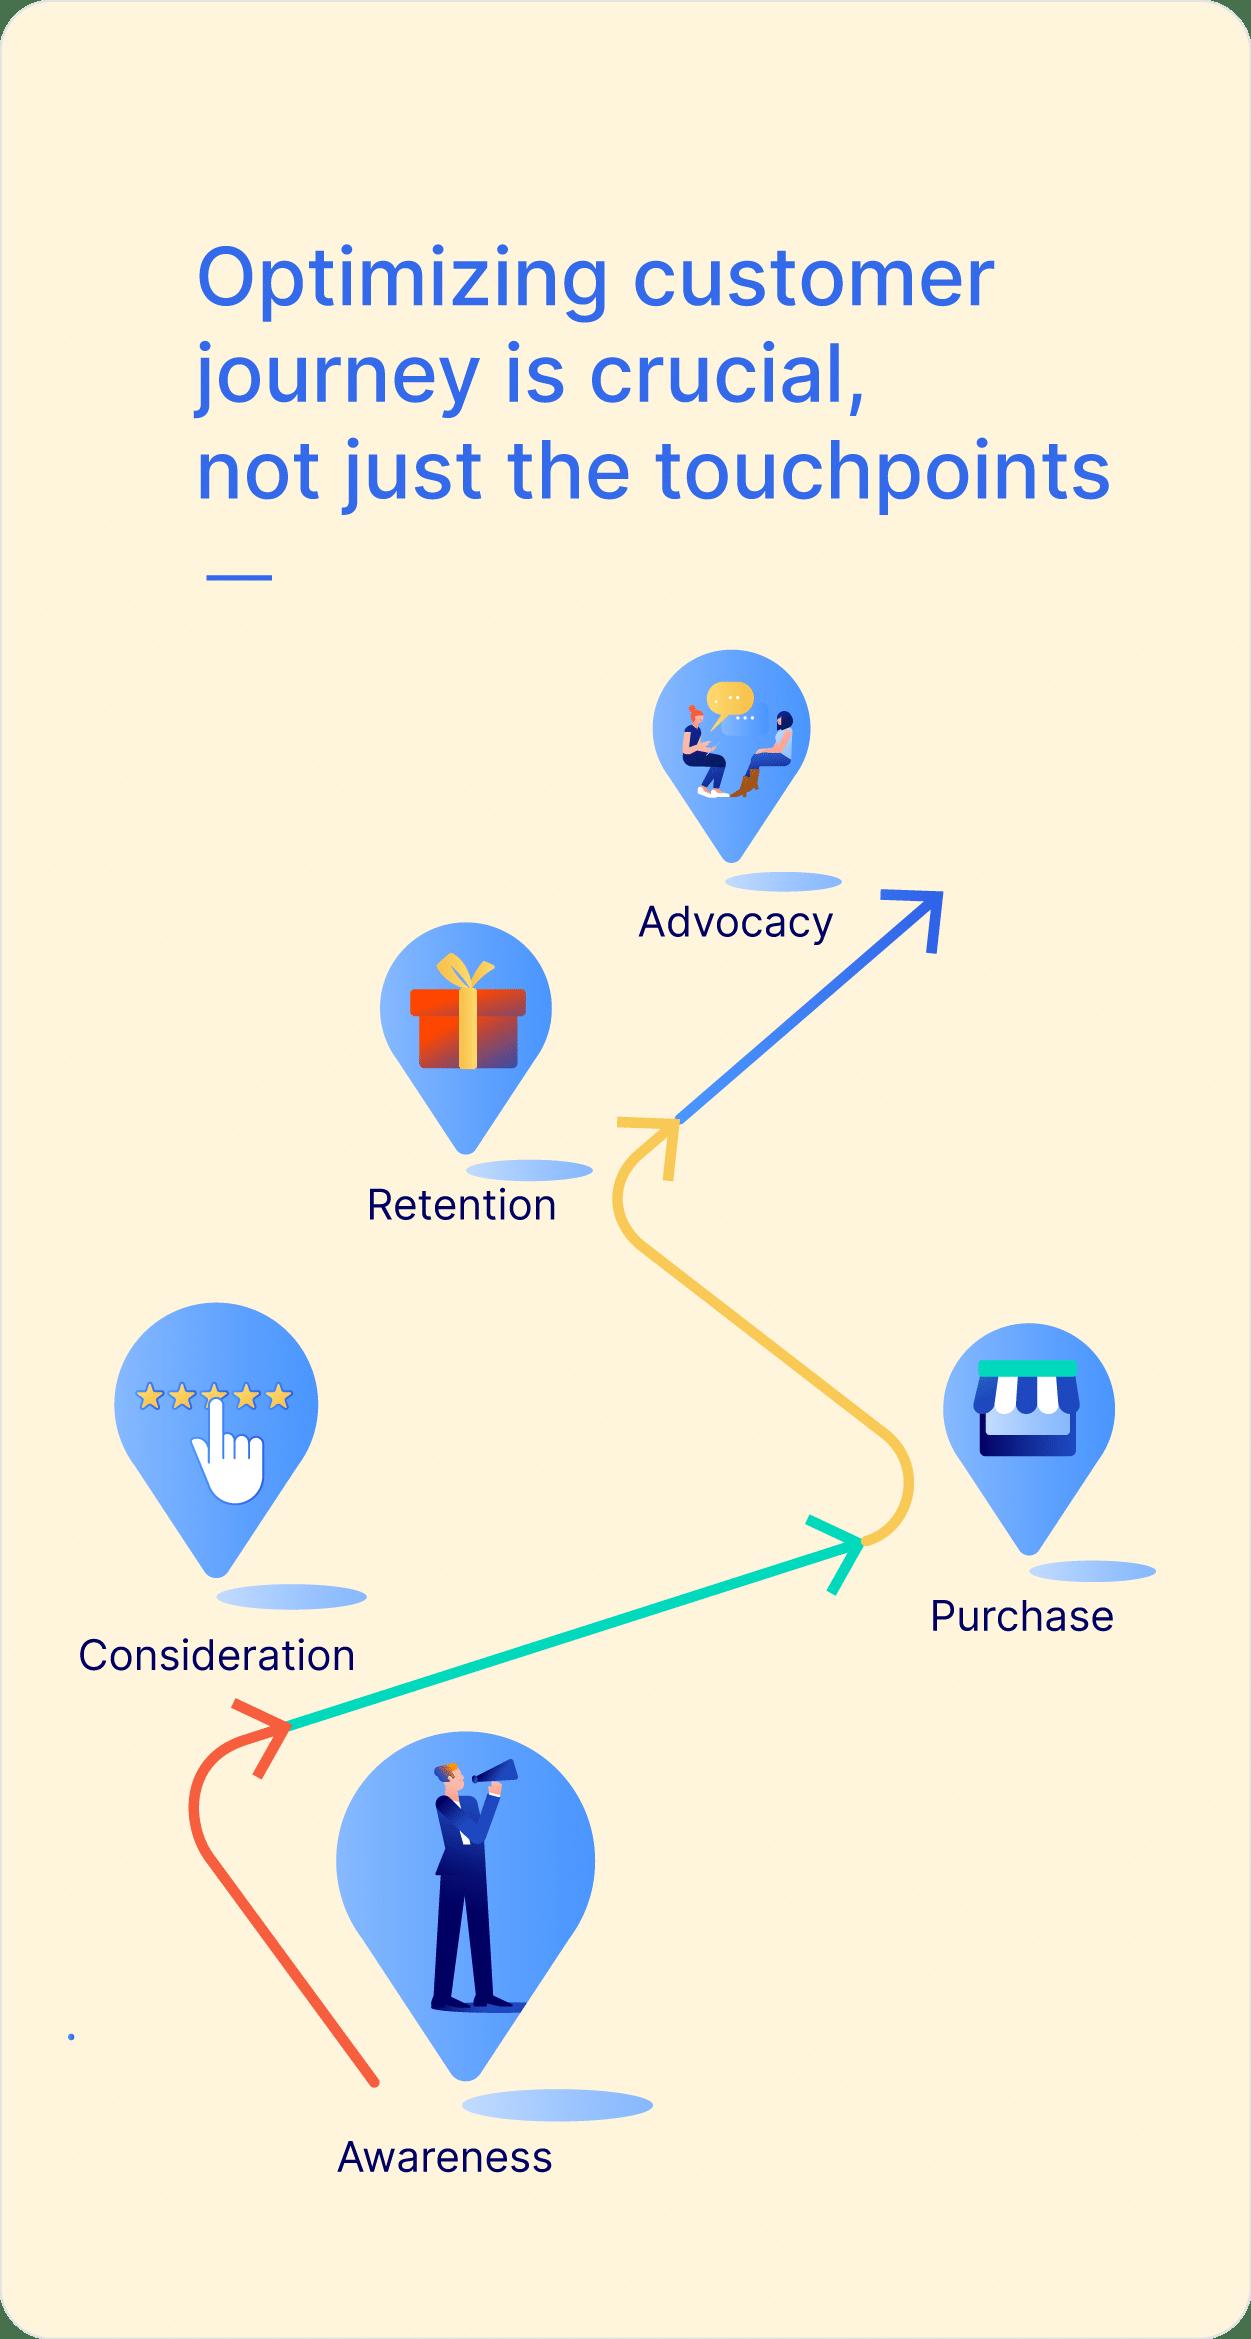 Optimizing customer journey is crucial